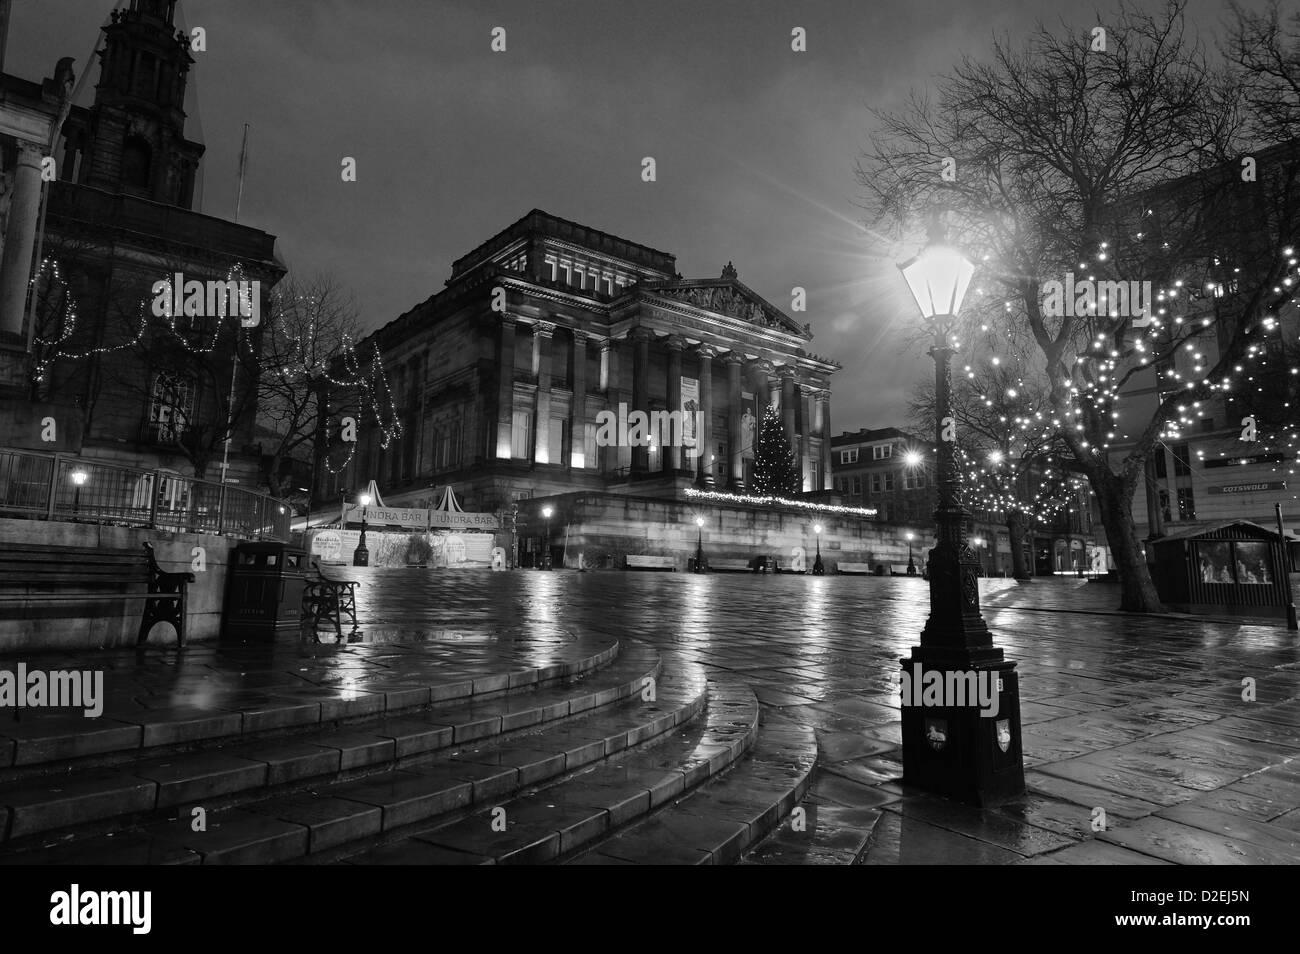 preston city centre, christmas day - Stock Image